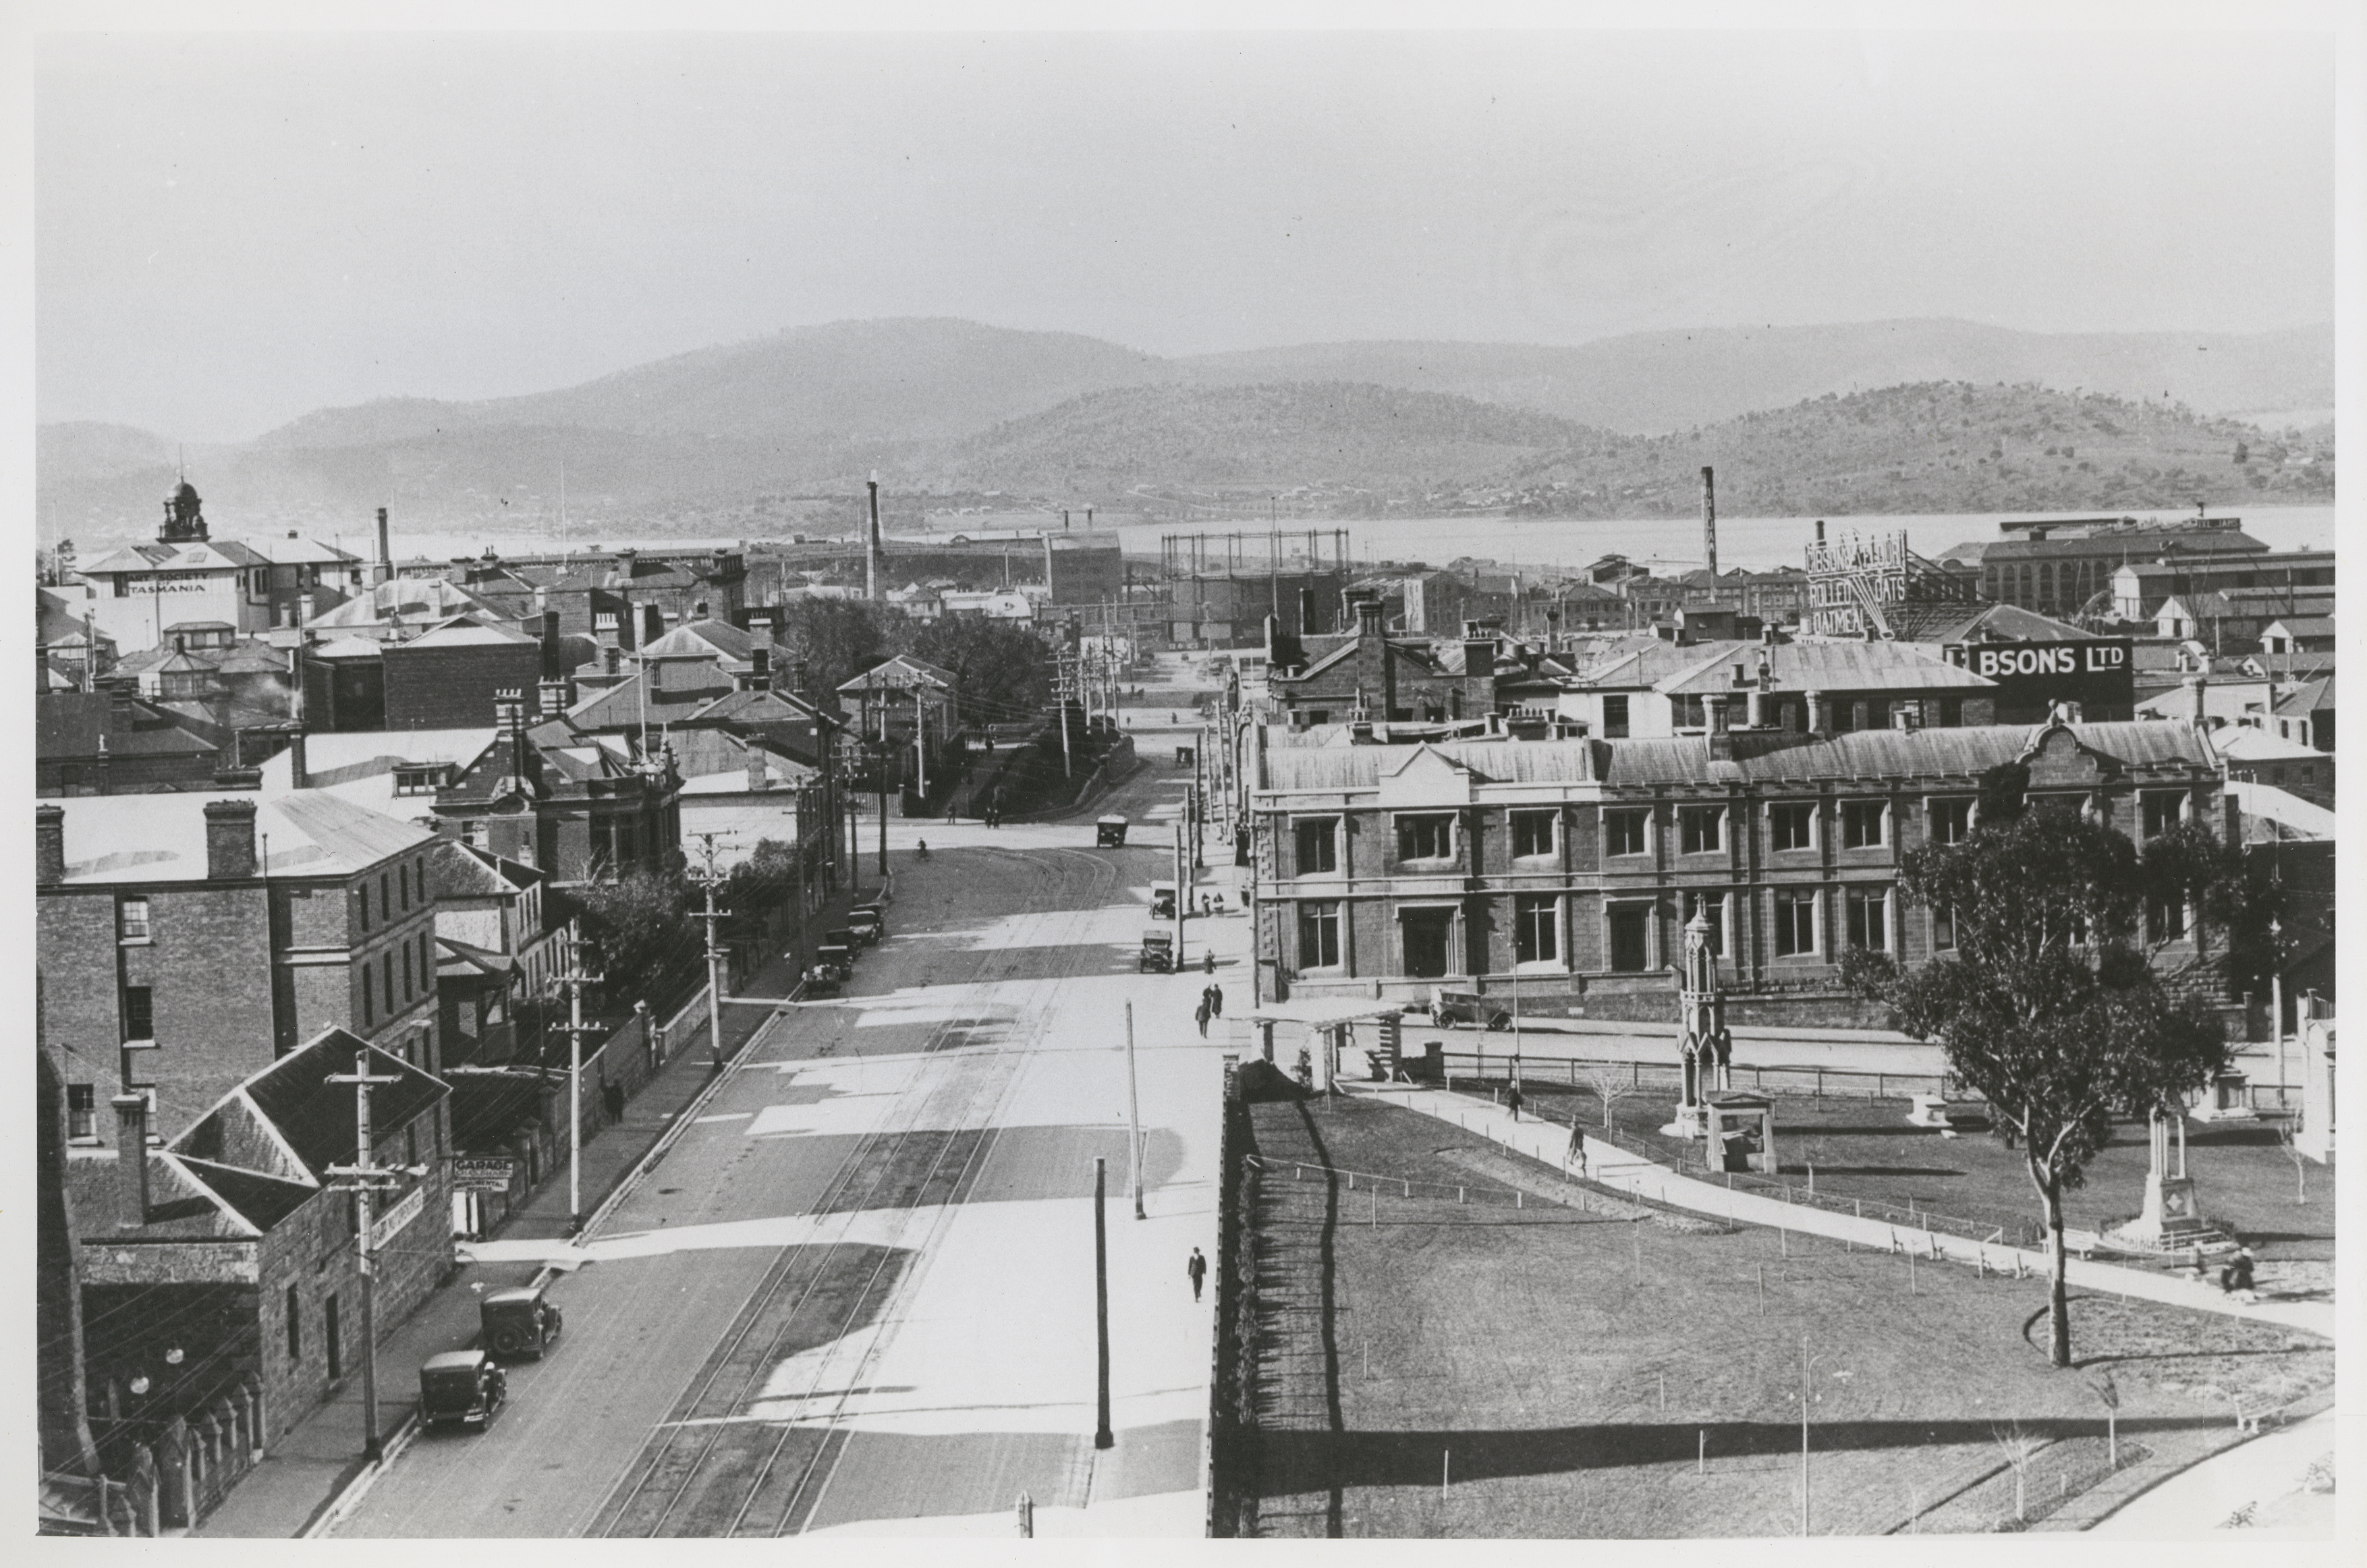 Down Davey Street 1920s/30s